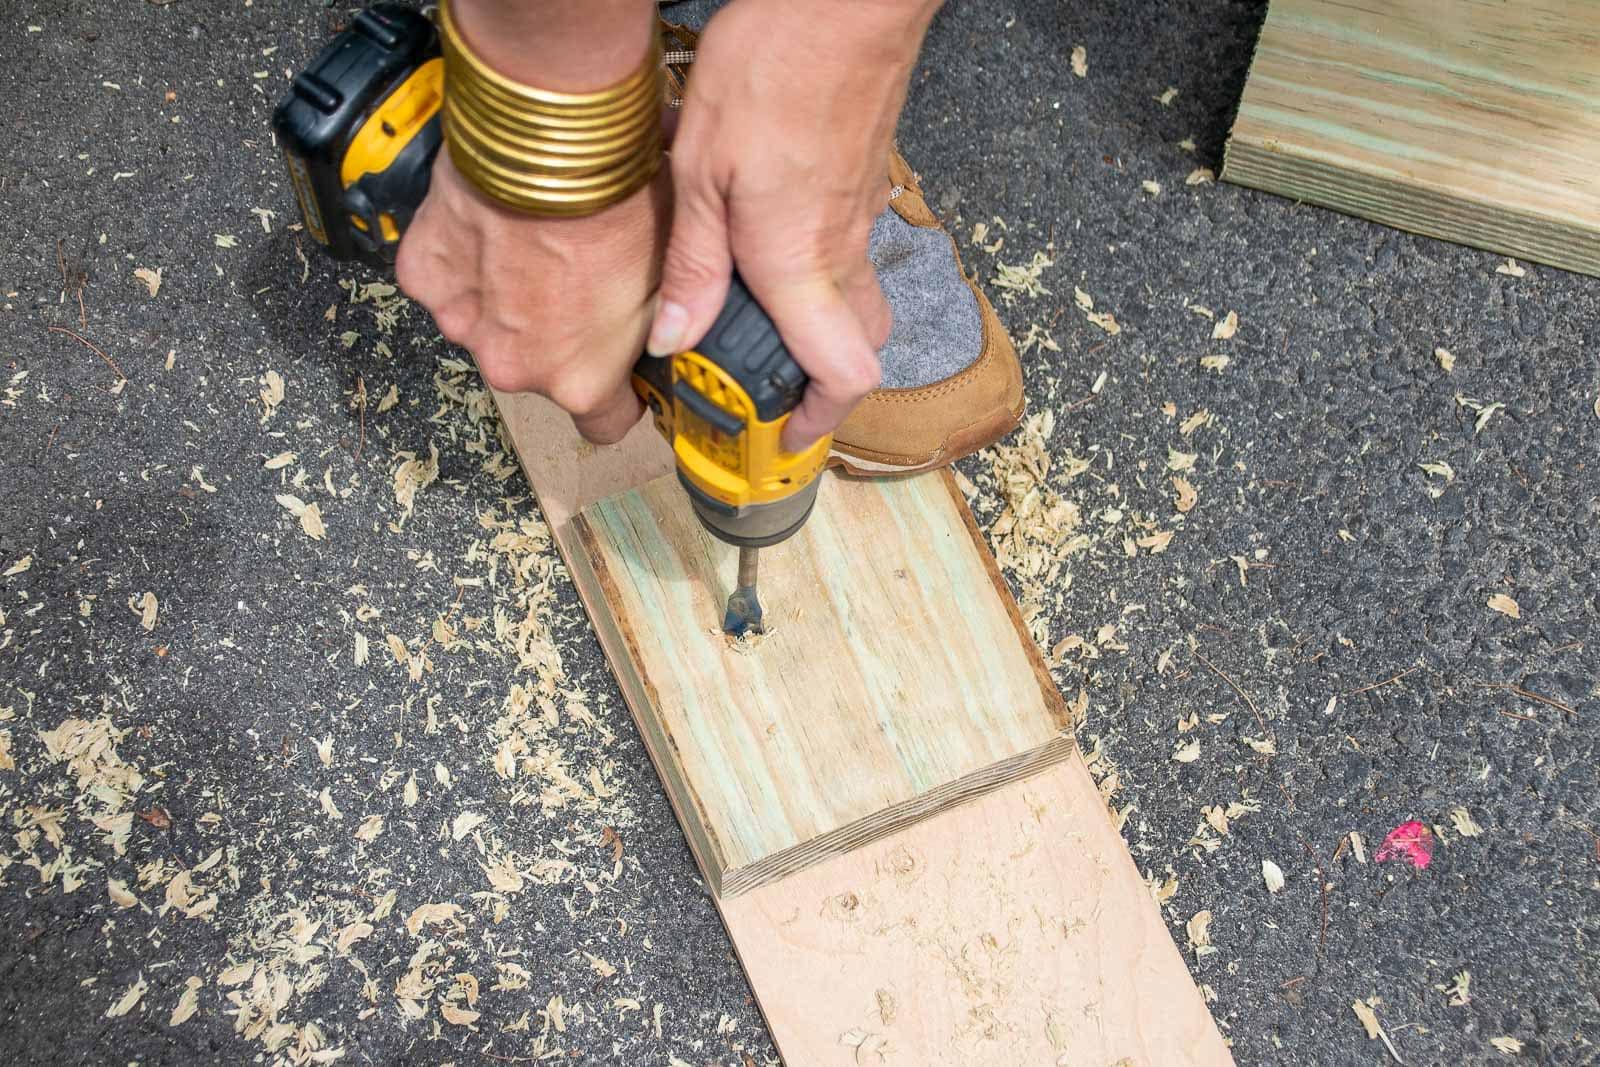 drilling holes through lumber